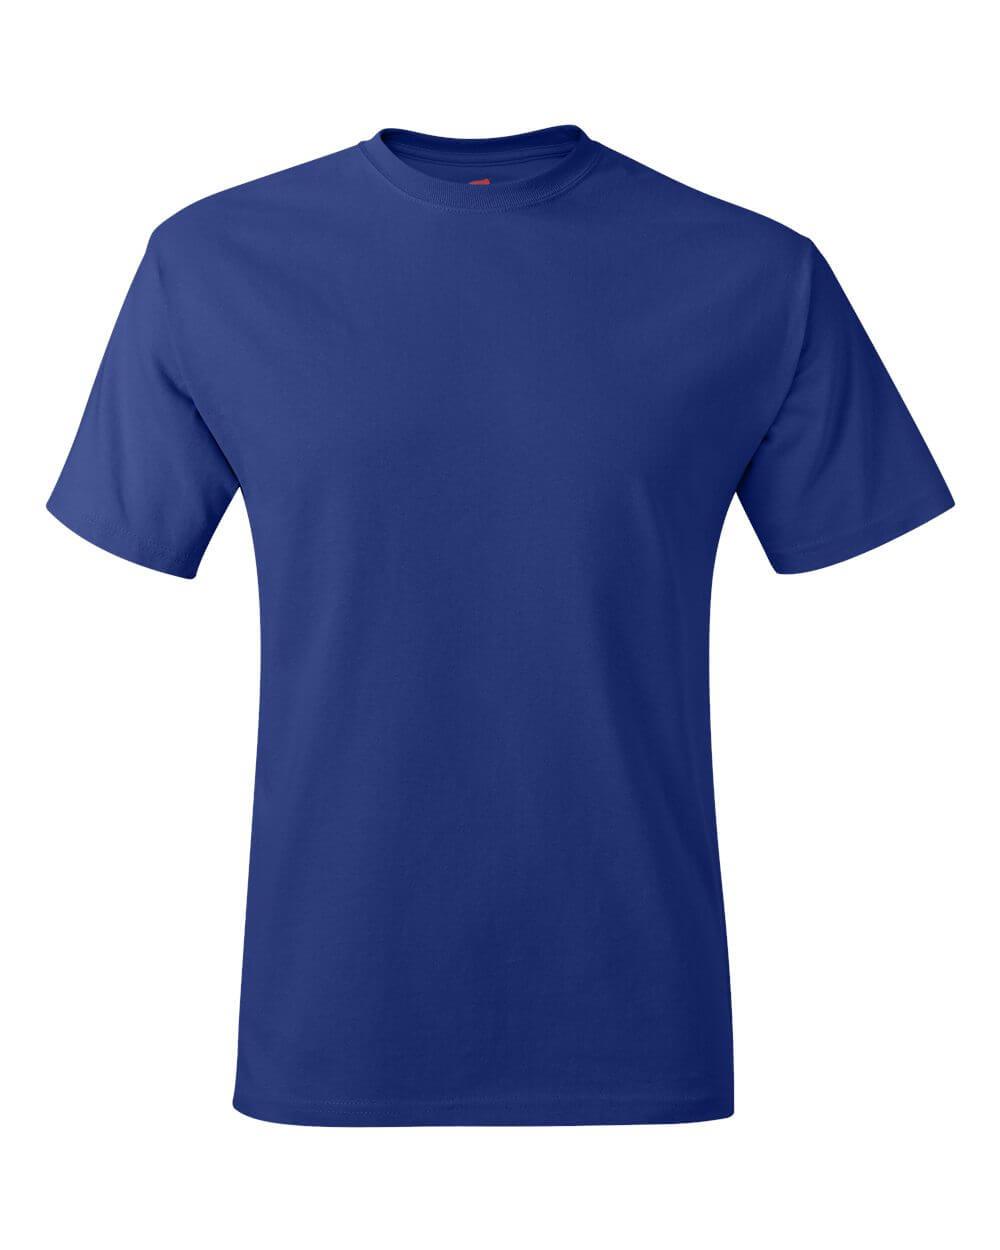 Hanes_5250_Deep_Royal Blue Custom T Shirts